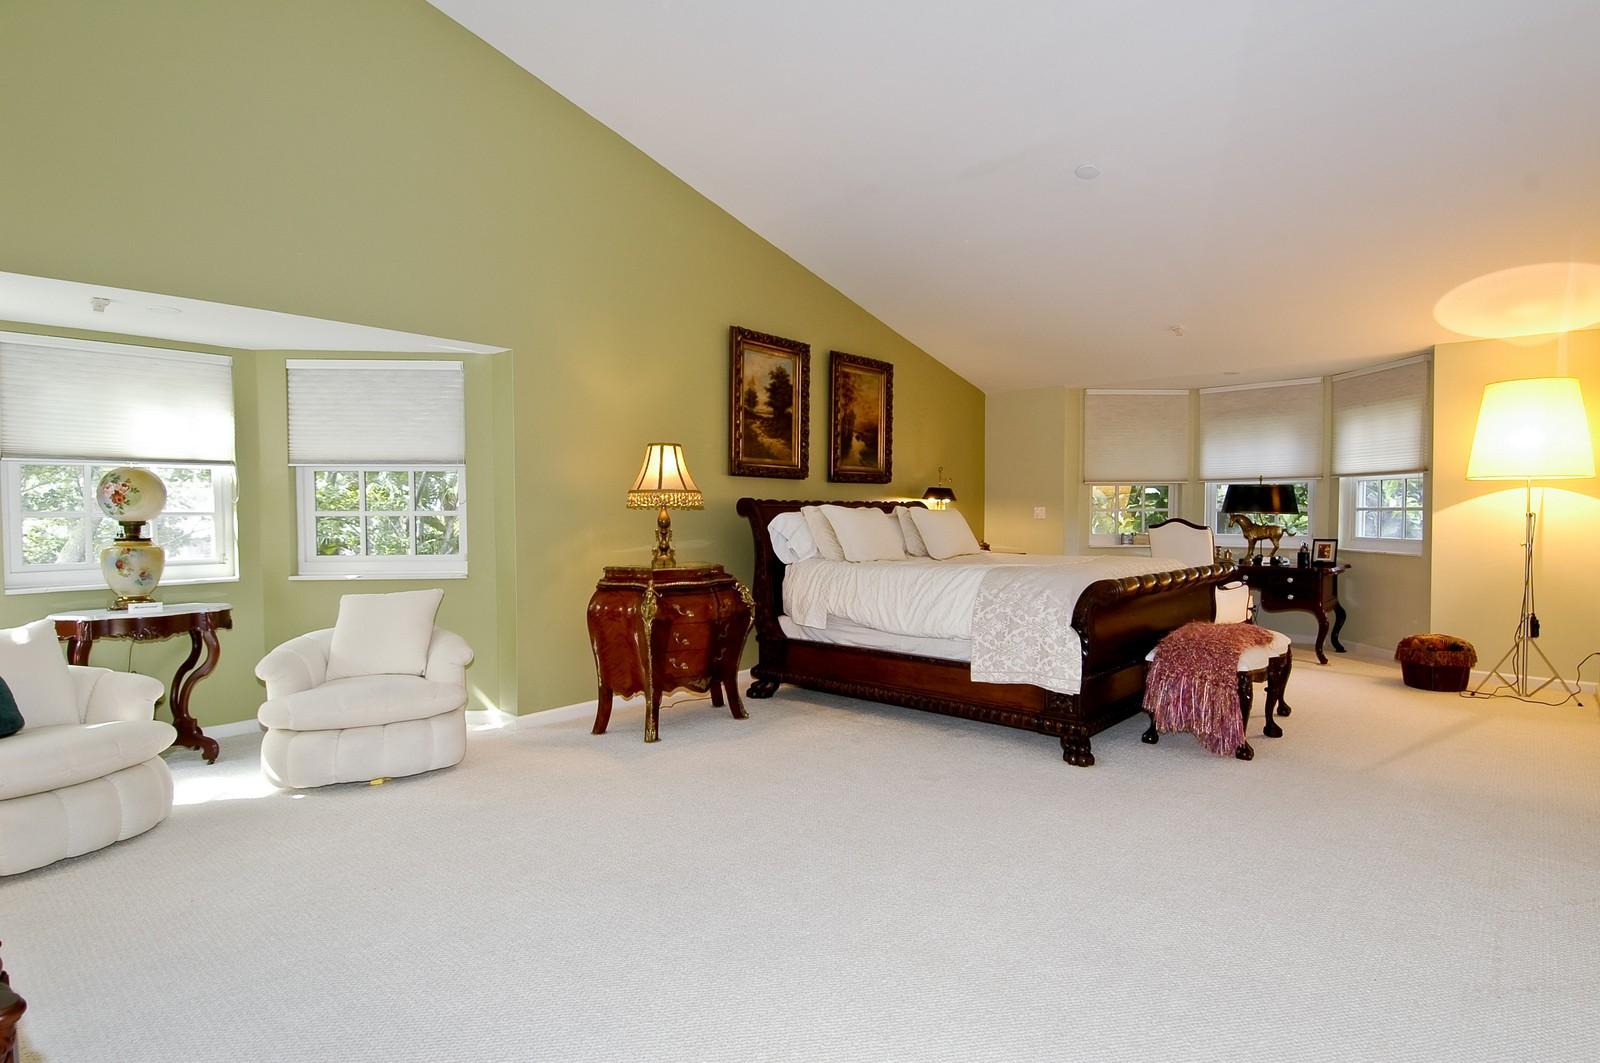 Real Estate Photography - 3685 NE 195 Ter, Aventura, FL, 33180 - Master Bedroom